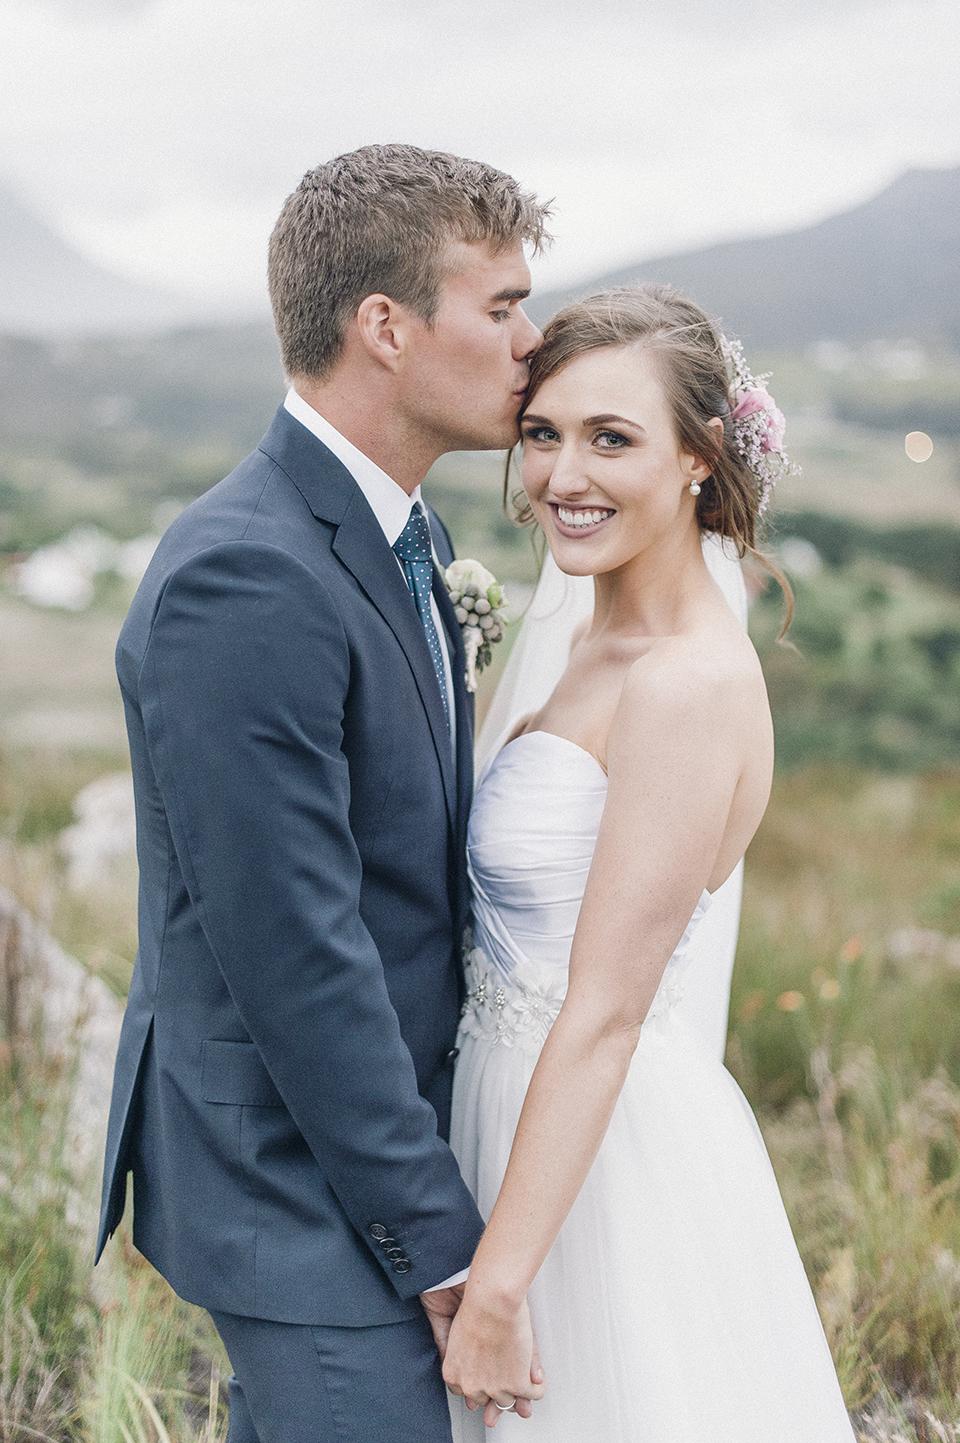 RyanParker_WeddingPhotographer_FineArt_CapeTown_BonaDea_Hermanus_S&A_DSC_2025.jpg